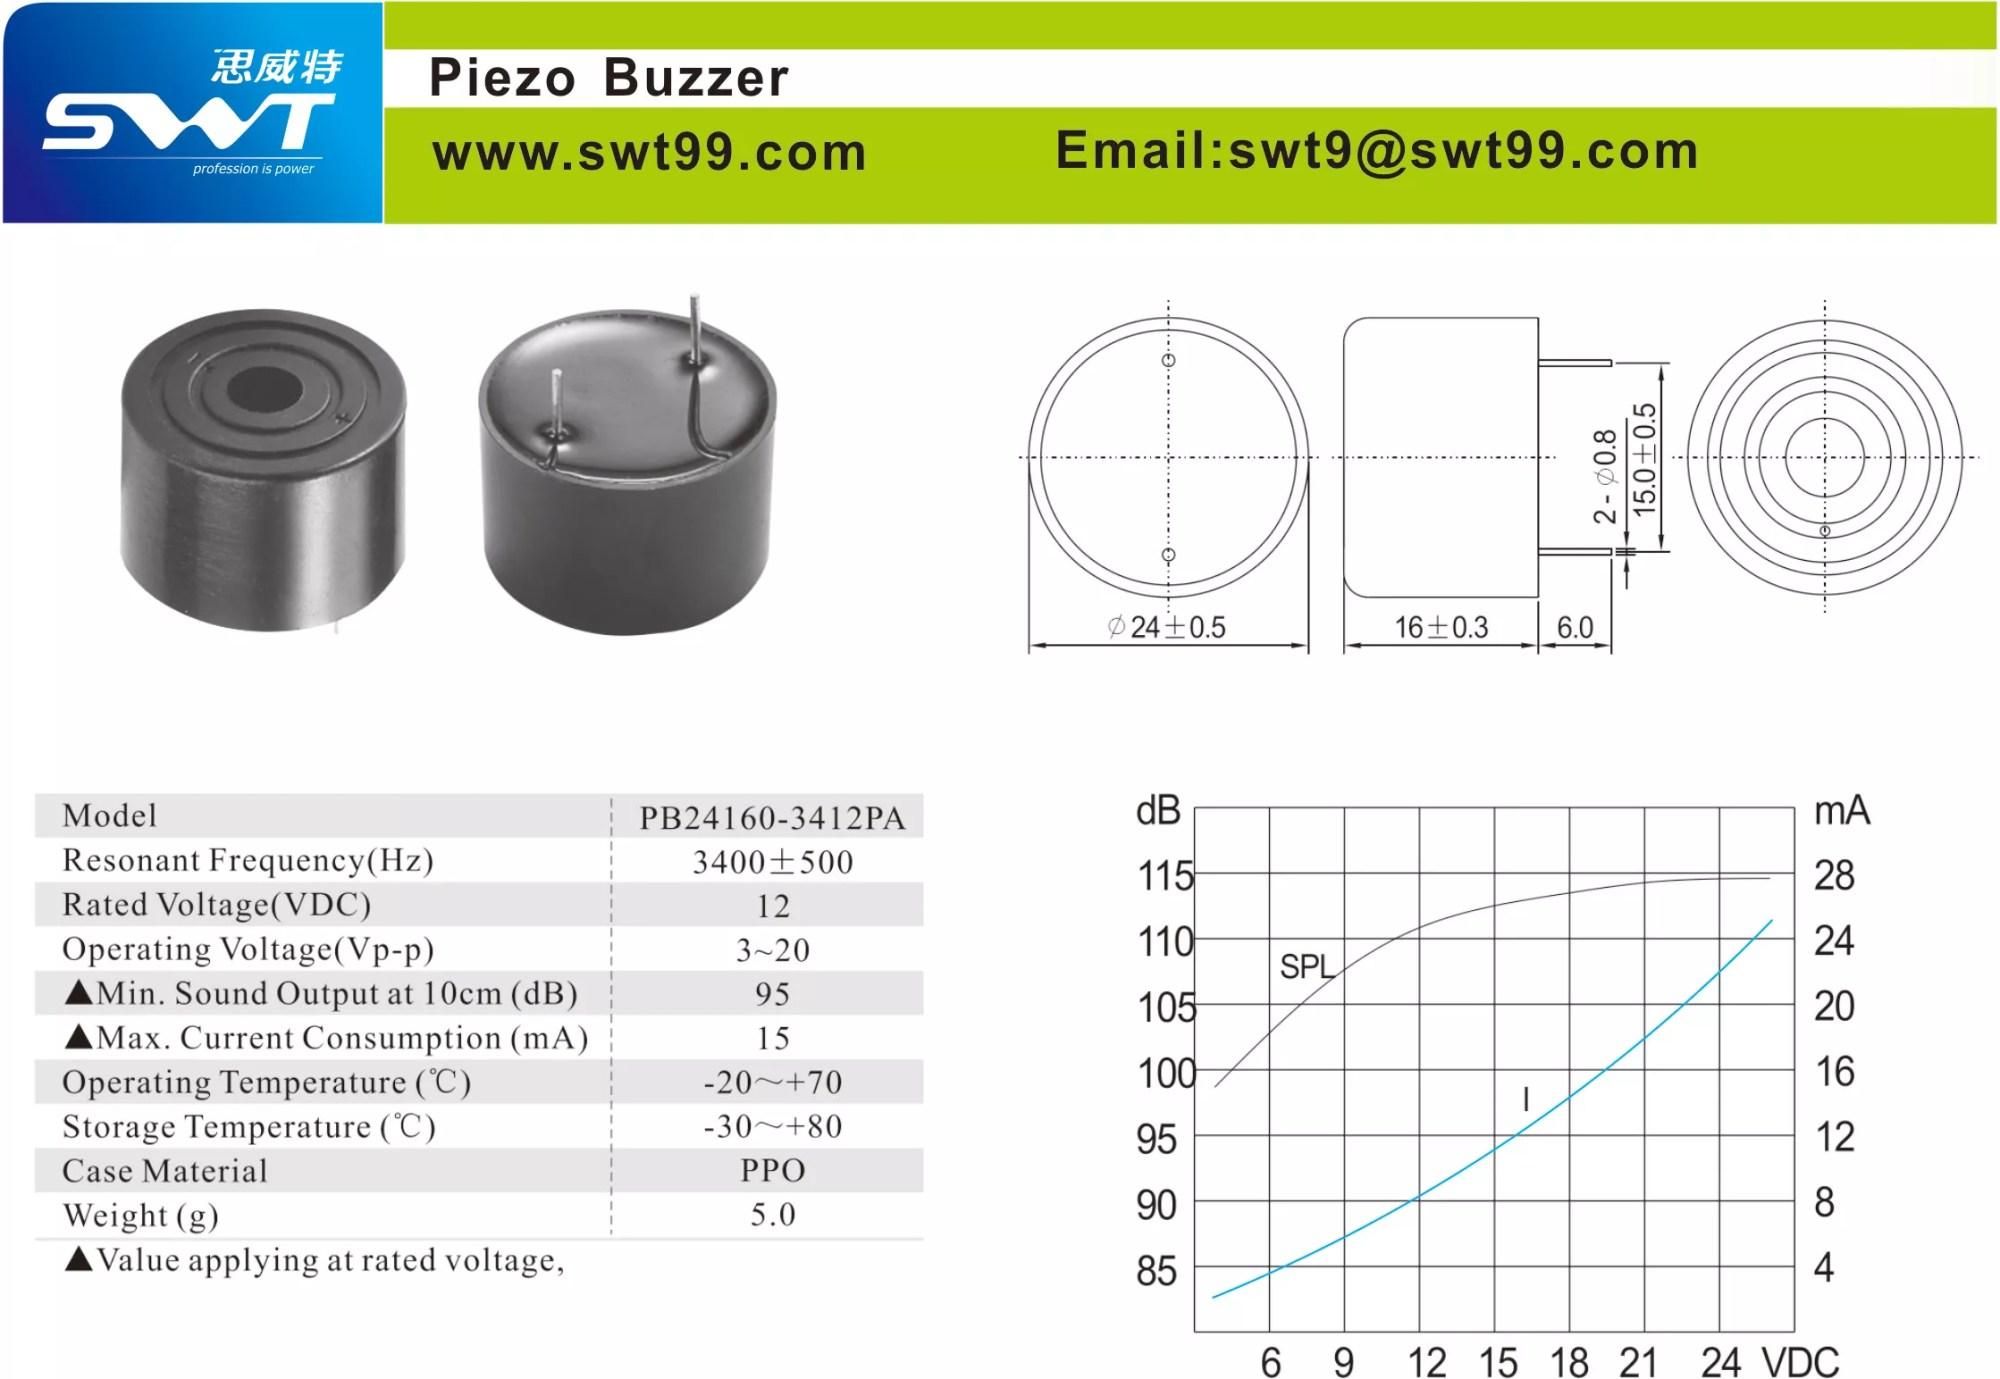 hight resolution of piezo buzzer diagram related keywords suggestions piezo buzzer buzzer piezo element piezo atomizer